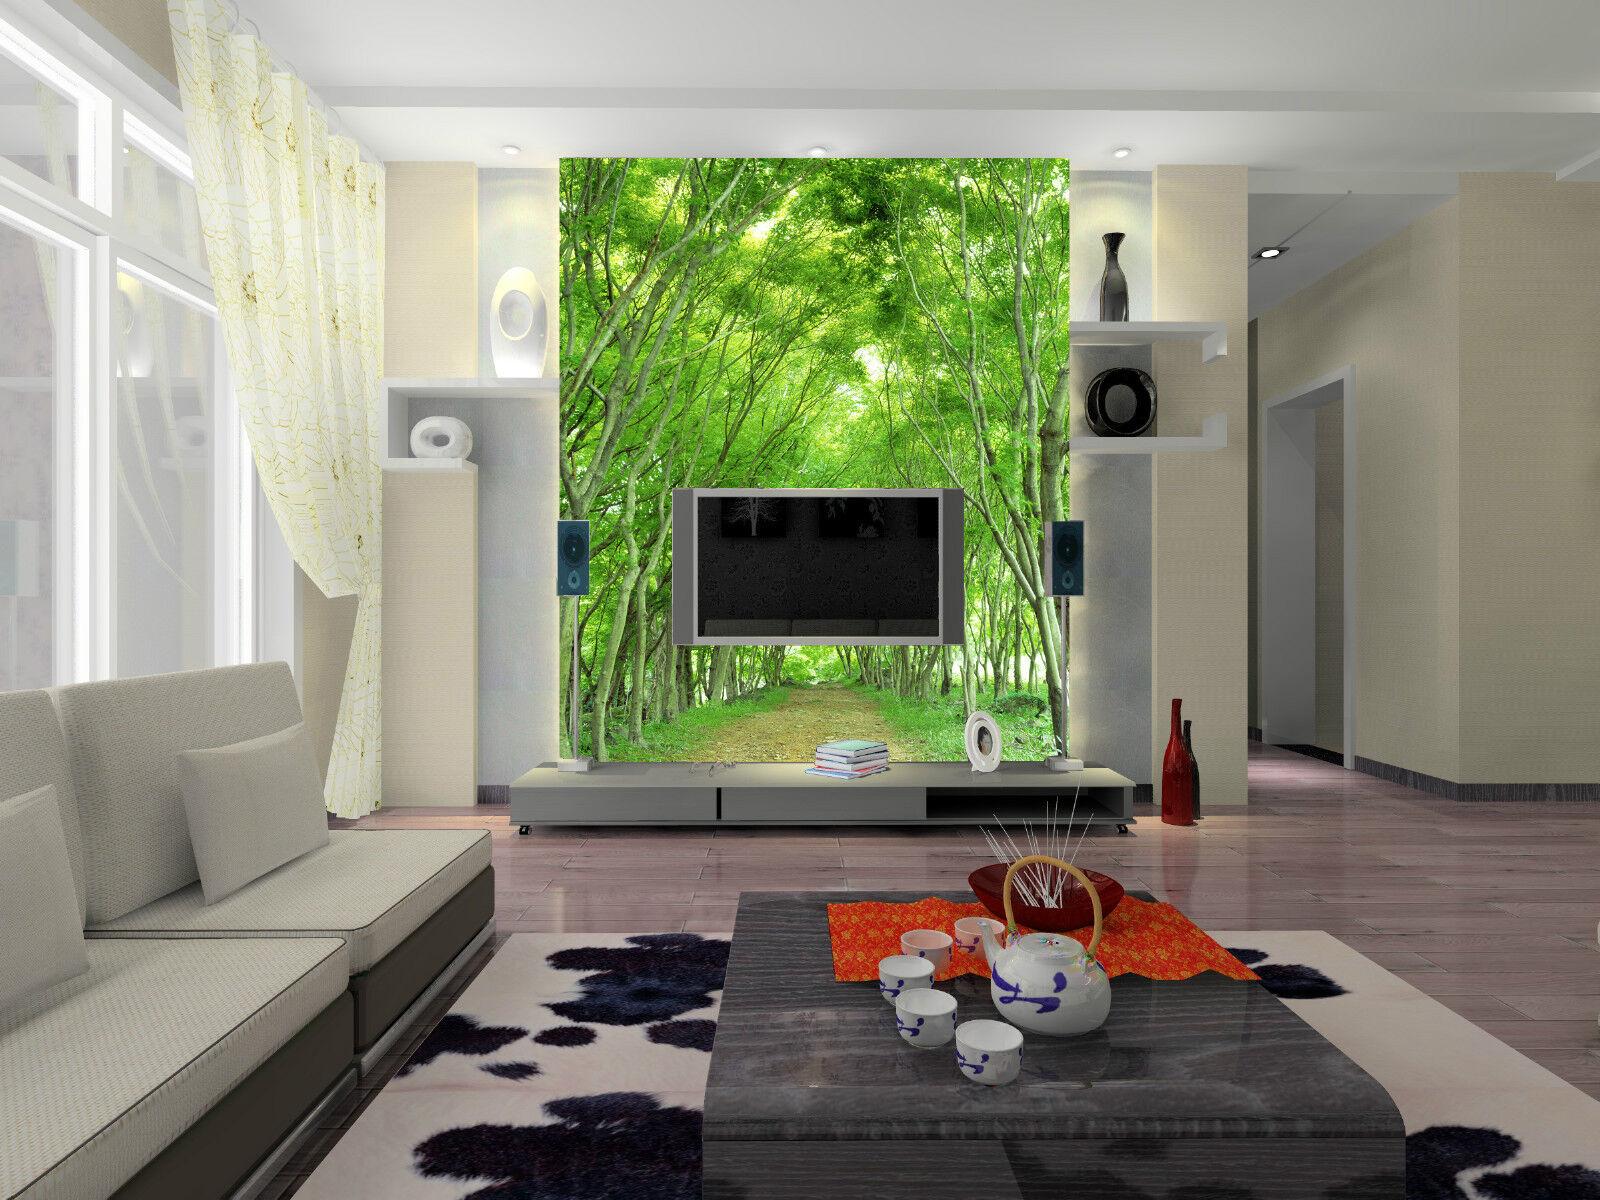 3D Green grass trees1 WallPaper Murals Wall Print Decal Wall Deco AJ WALLPAPER